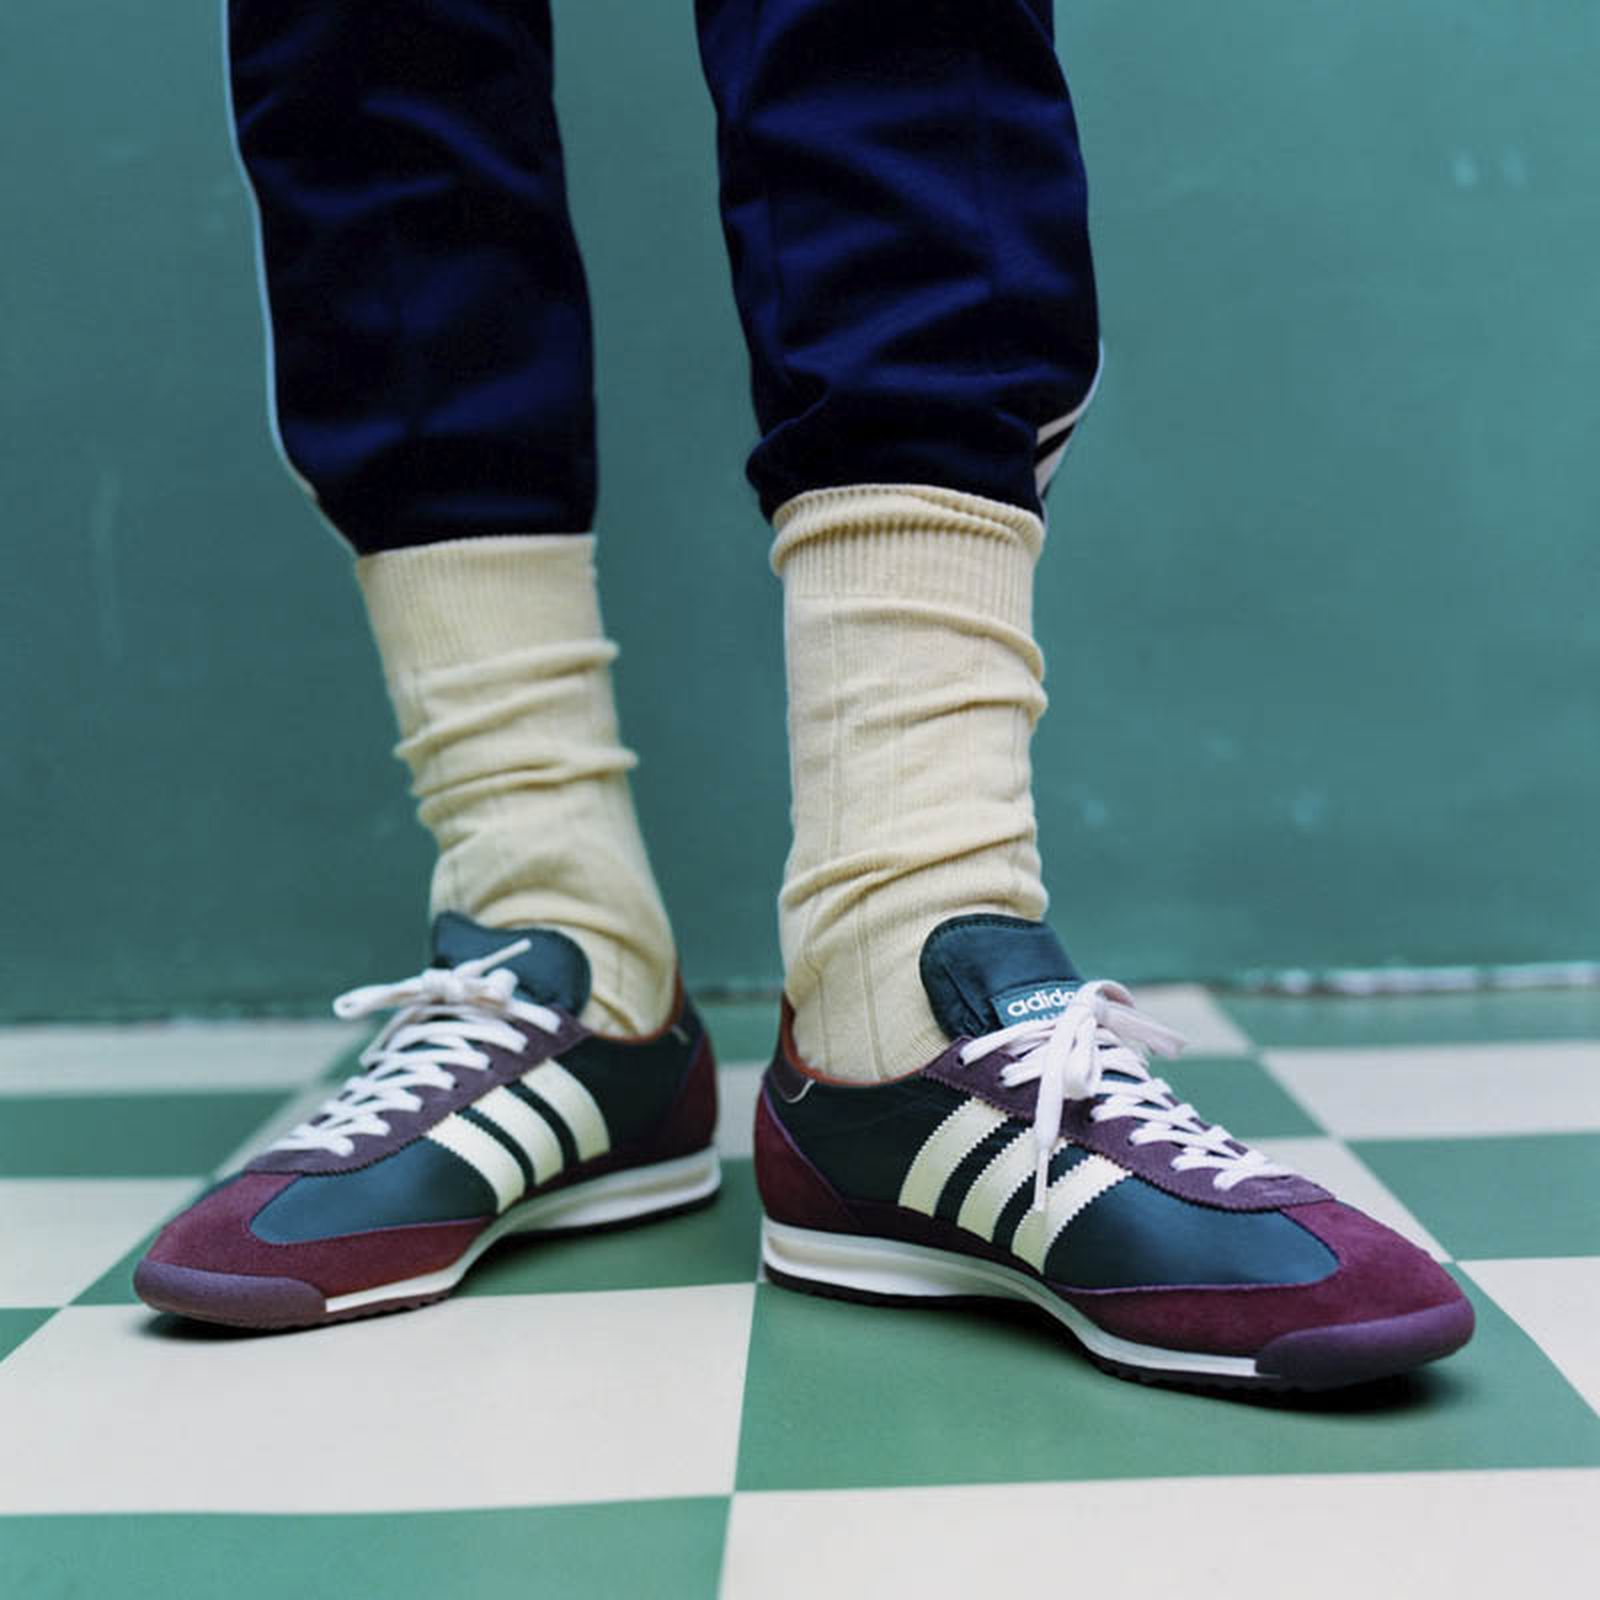 wales-bonner-adidas-originals-samba-release-date-price-campaign-09